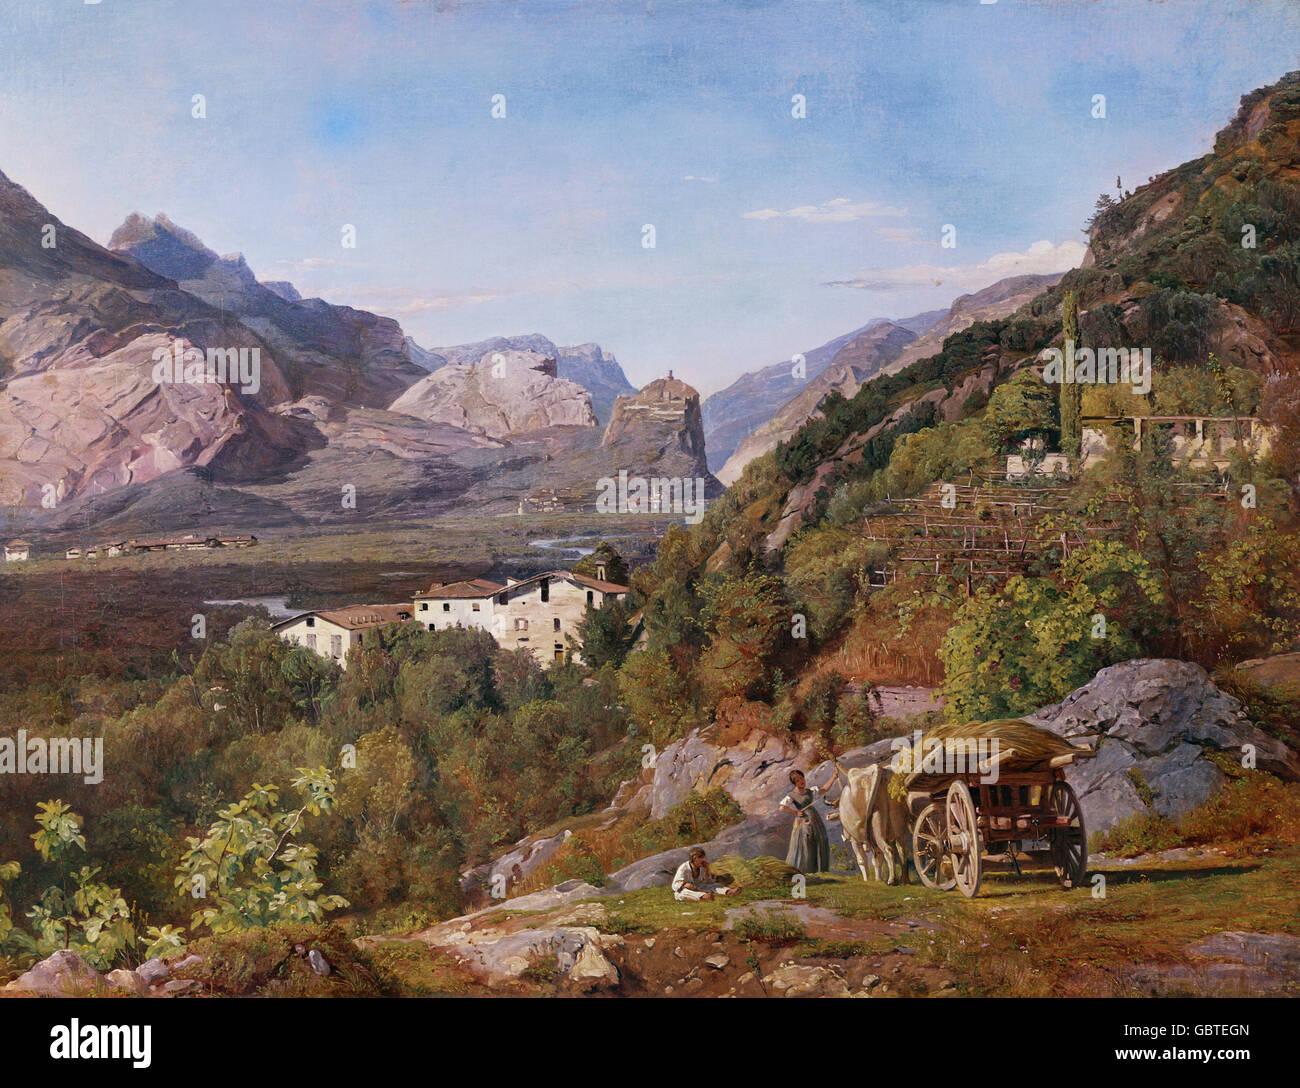 fine arts, Waldmueller, Ferdinand Georg (1793 - 1865), painting, 'Blick auf Arco' (View of Arco), 1841, - Stock Image